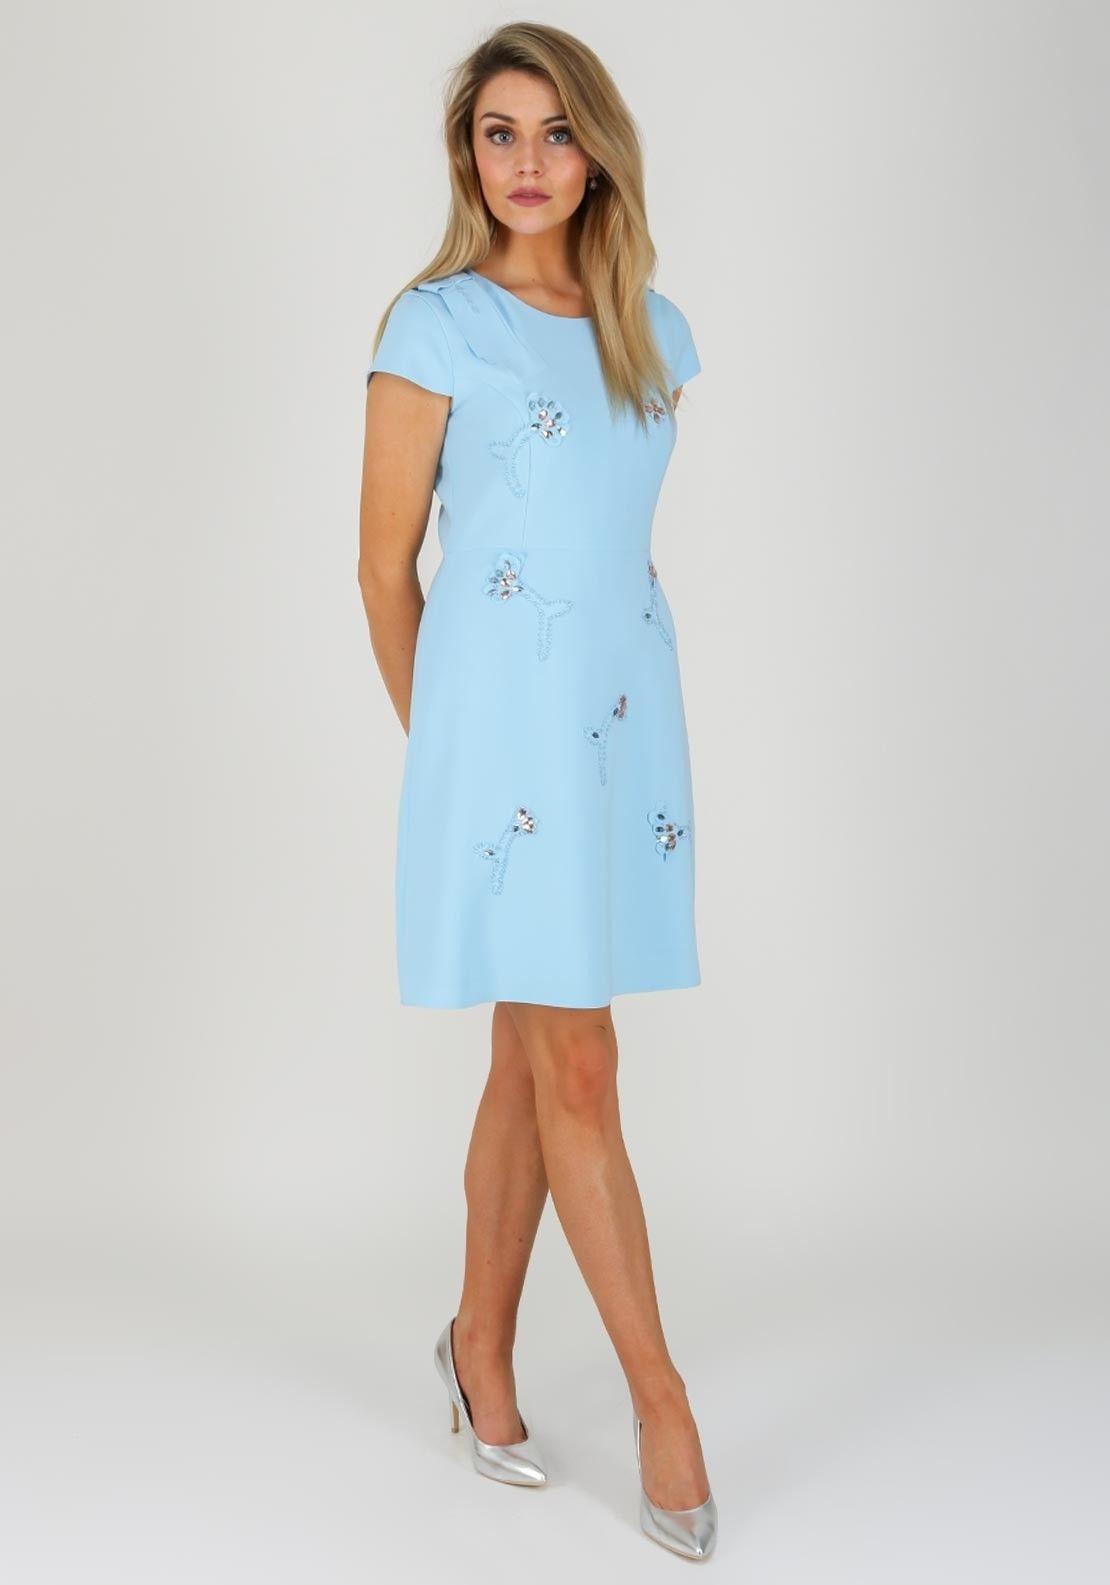 f0dd09429e38 Daisy May Embellished Print Dress